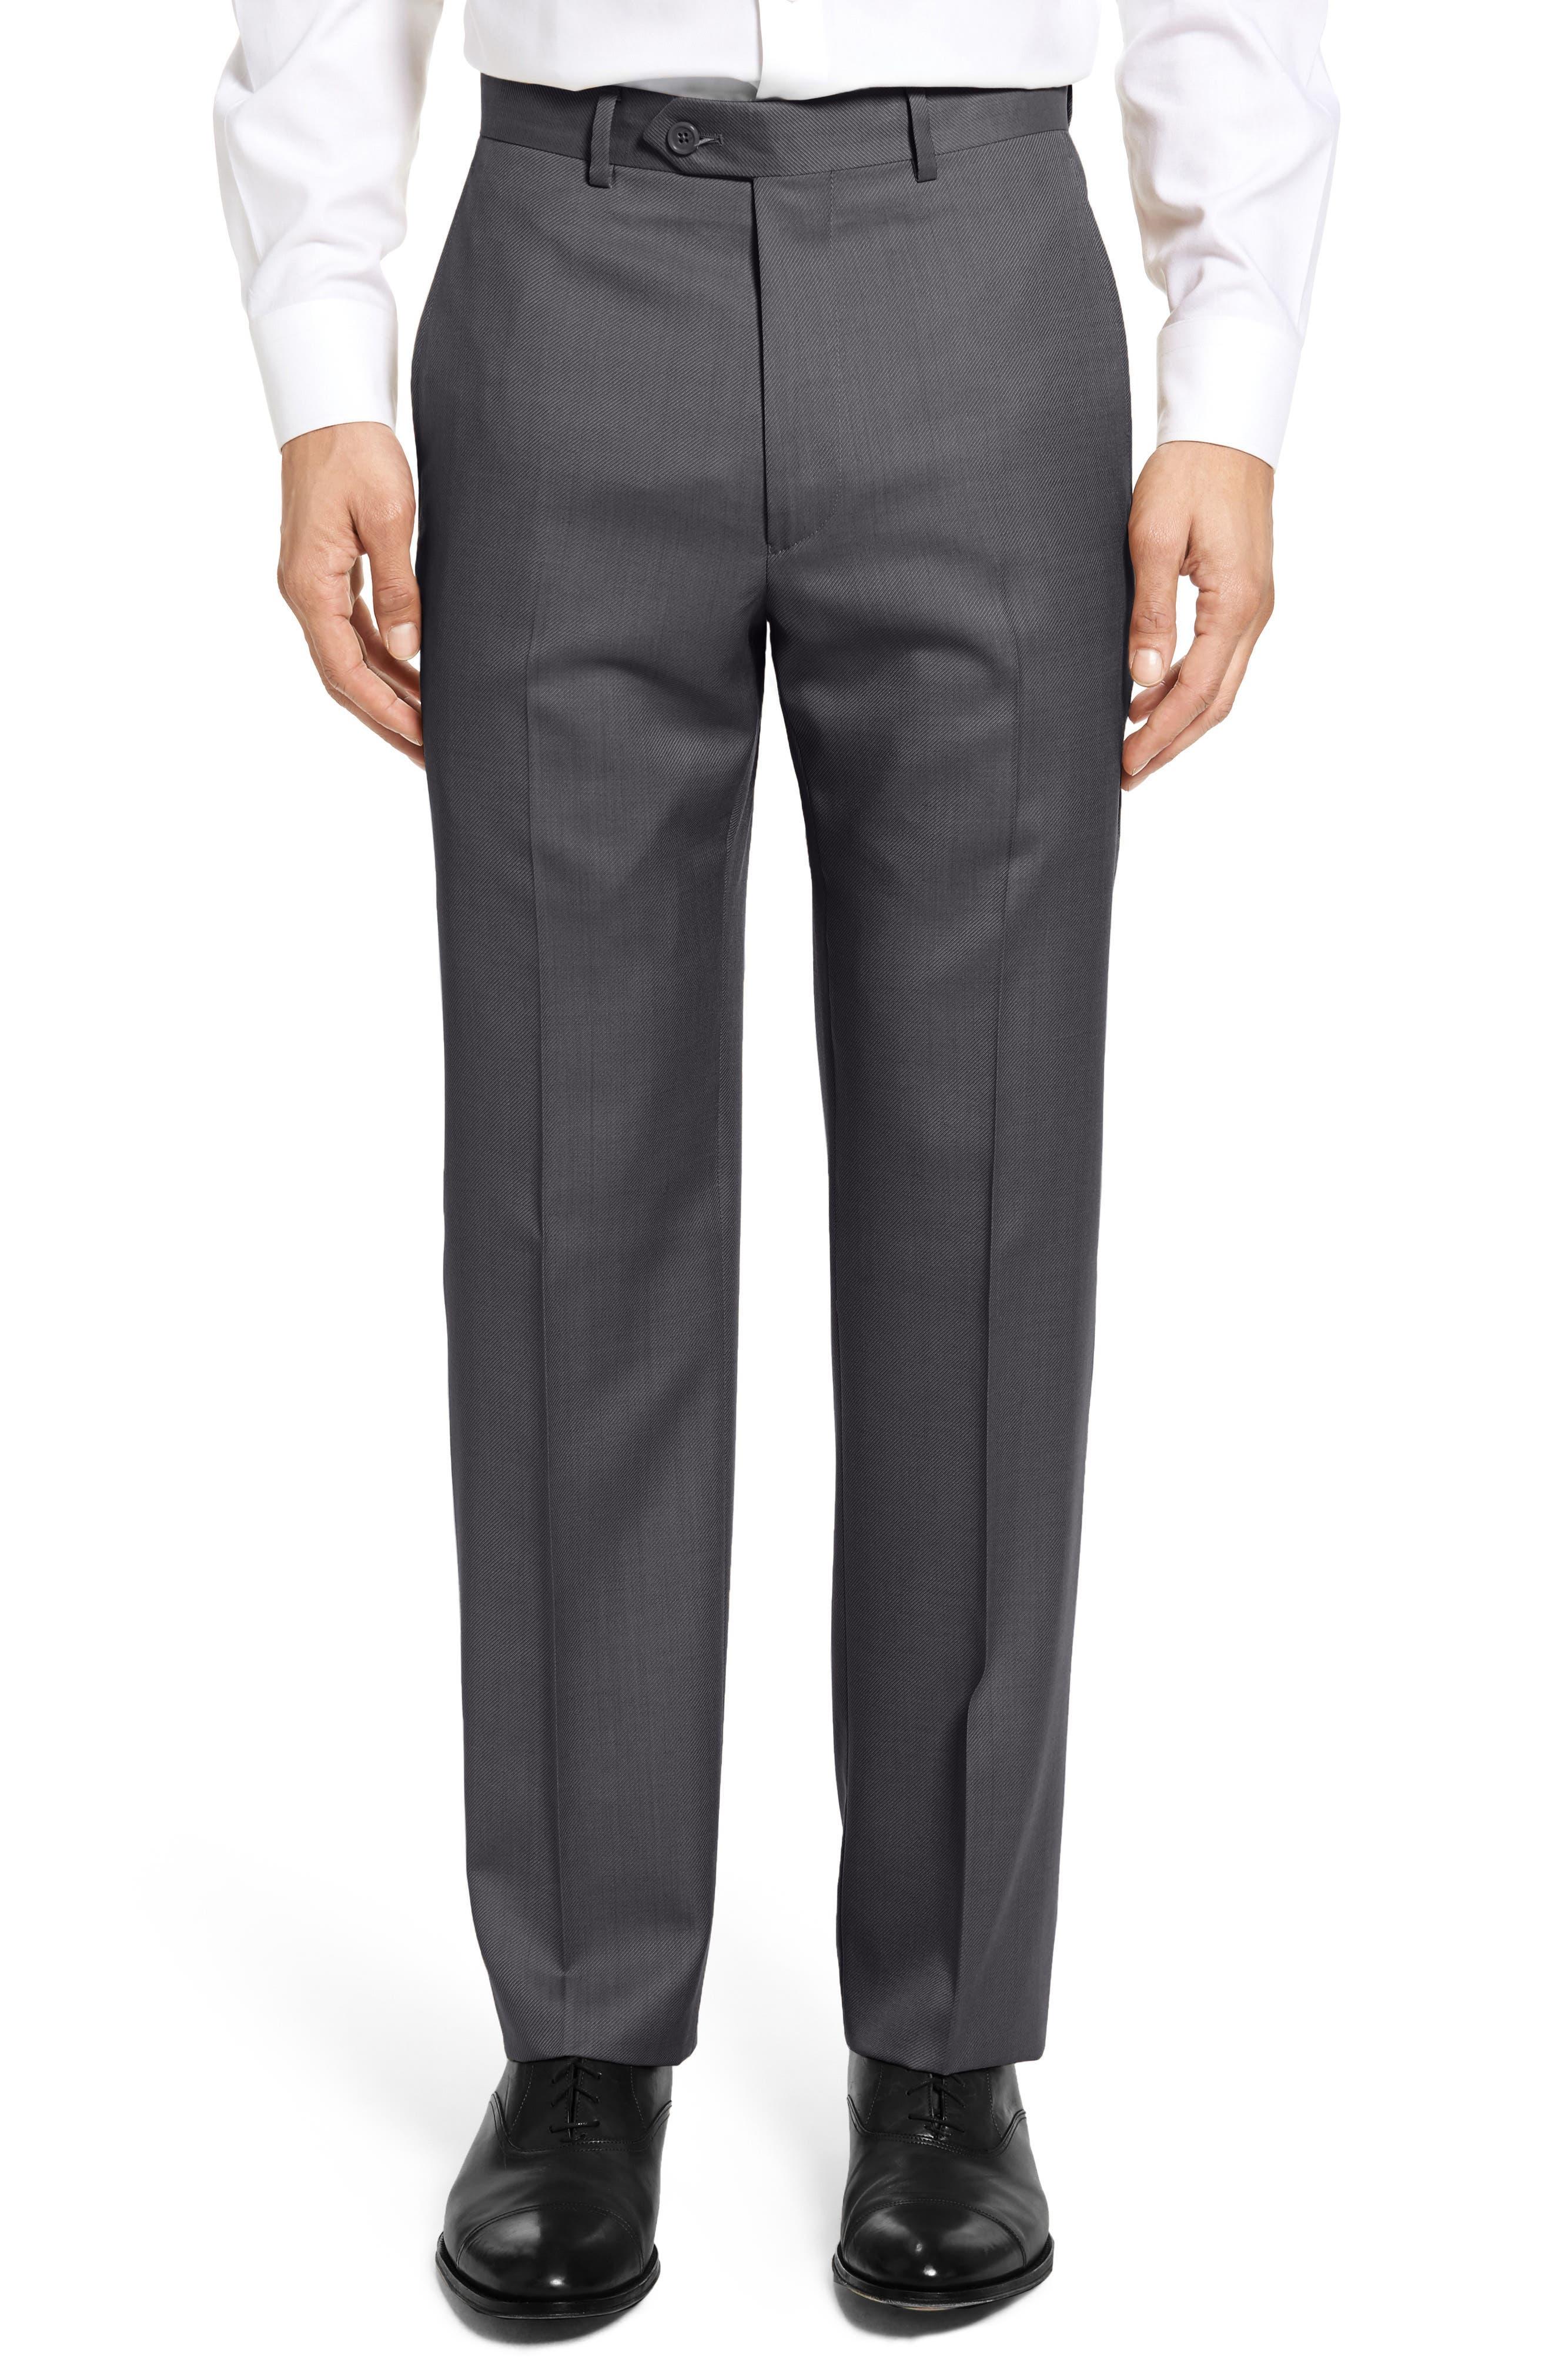 Santorelli Flat Front Twill Wool Trousers